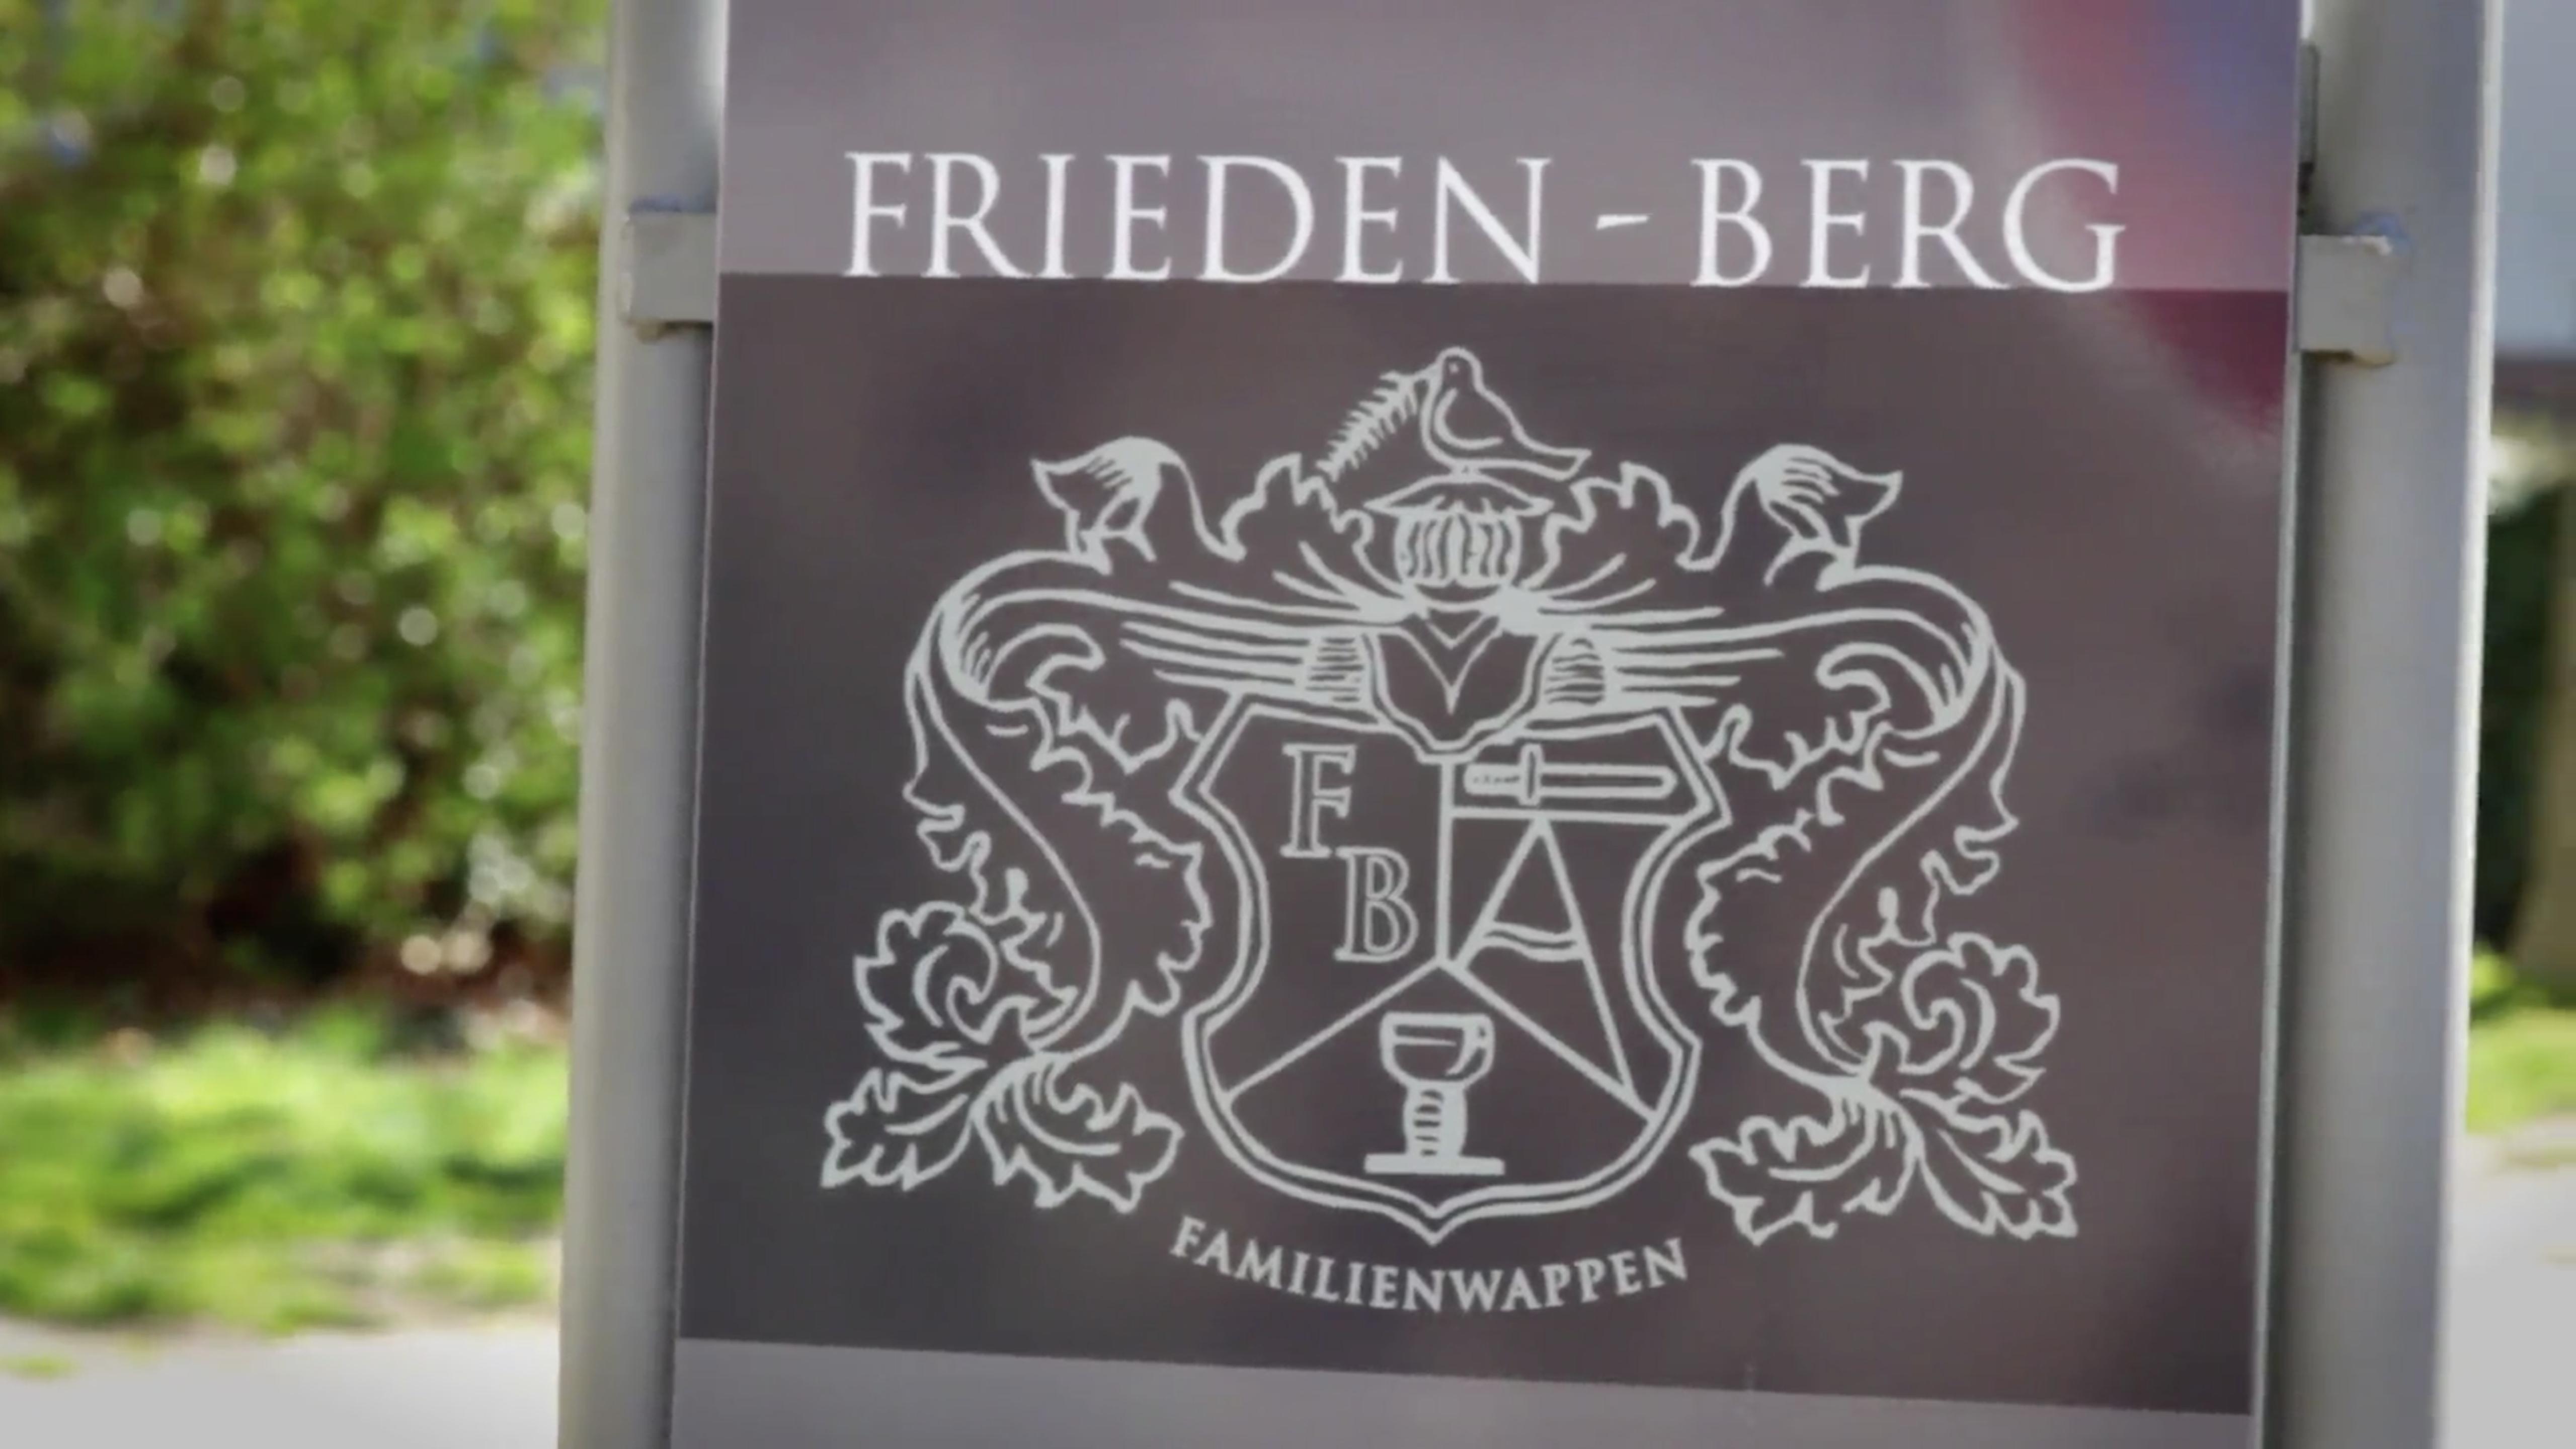 The Frieden-Berg winery in Nittel